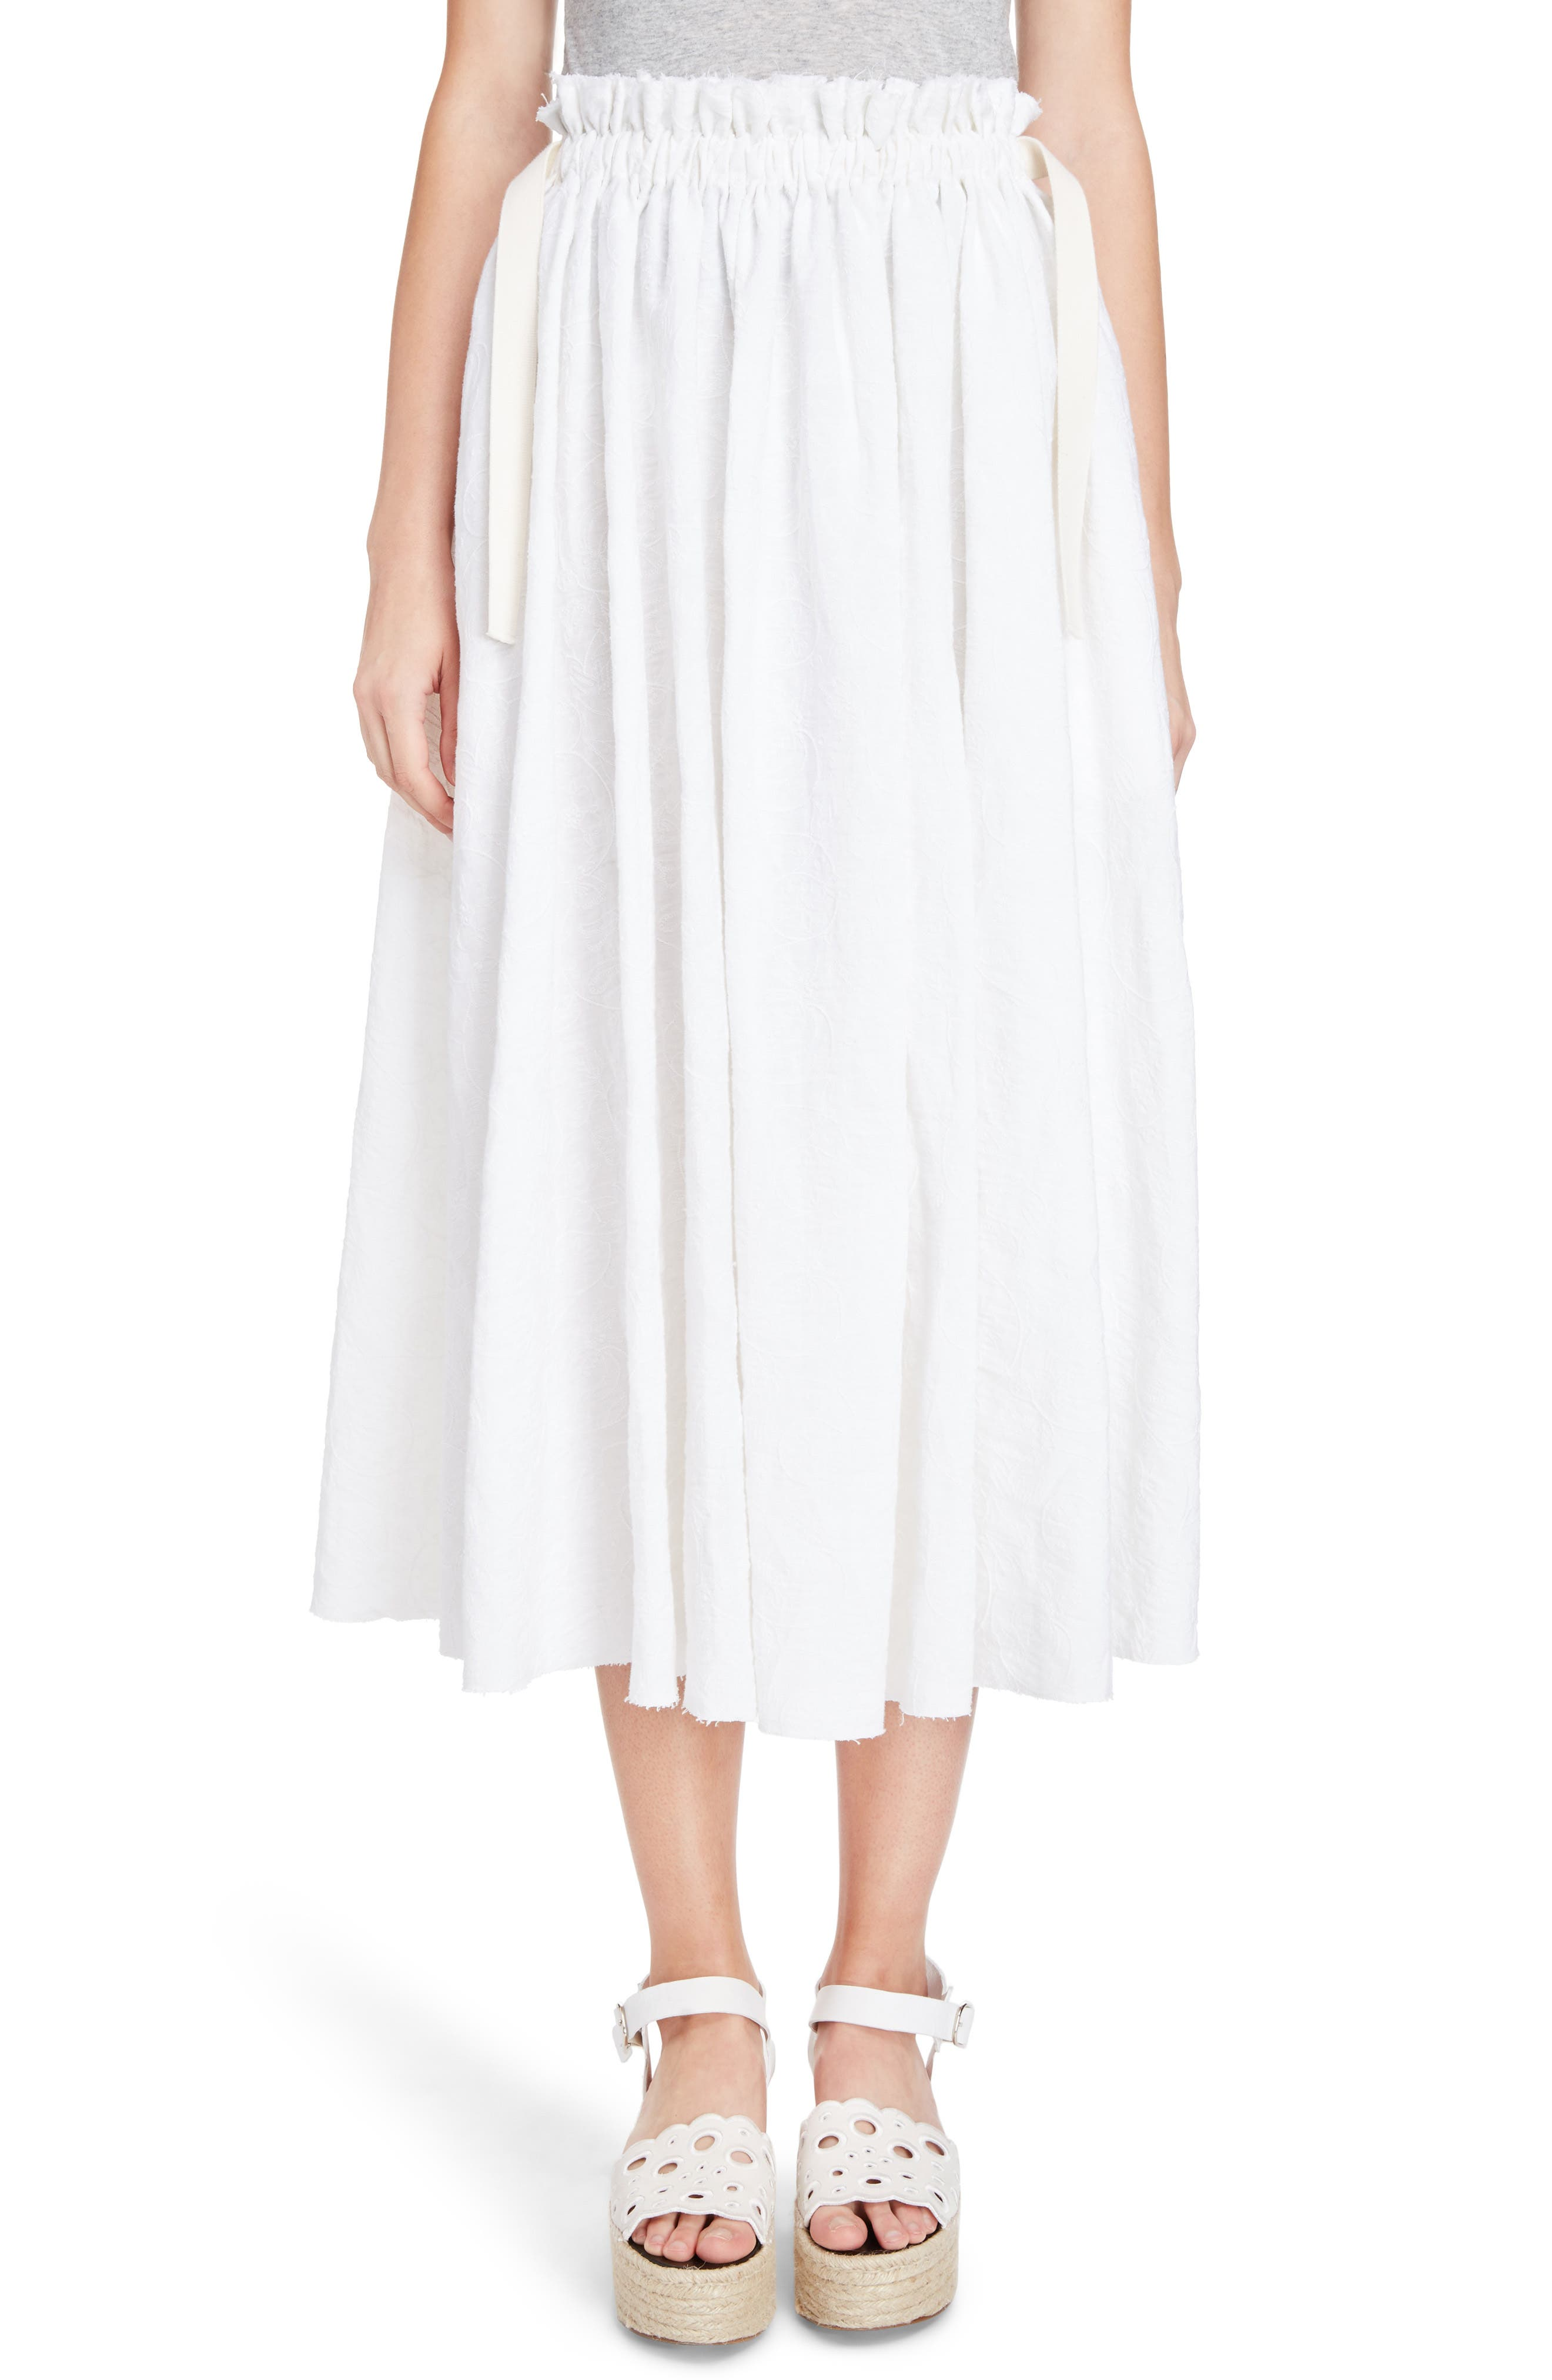 Alternate Image 1 Selected - Loewe Drawstring Waist Broderie Anglaise Skirt